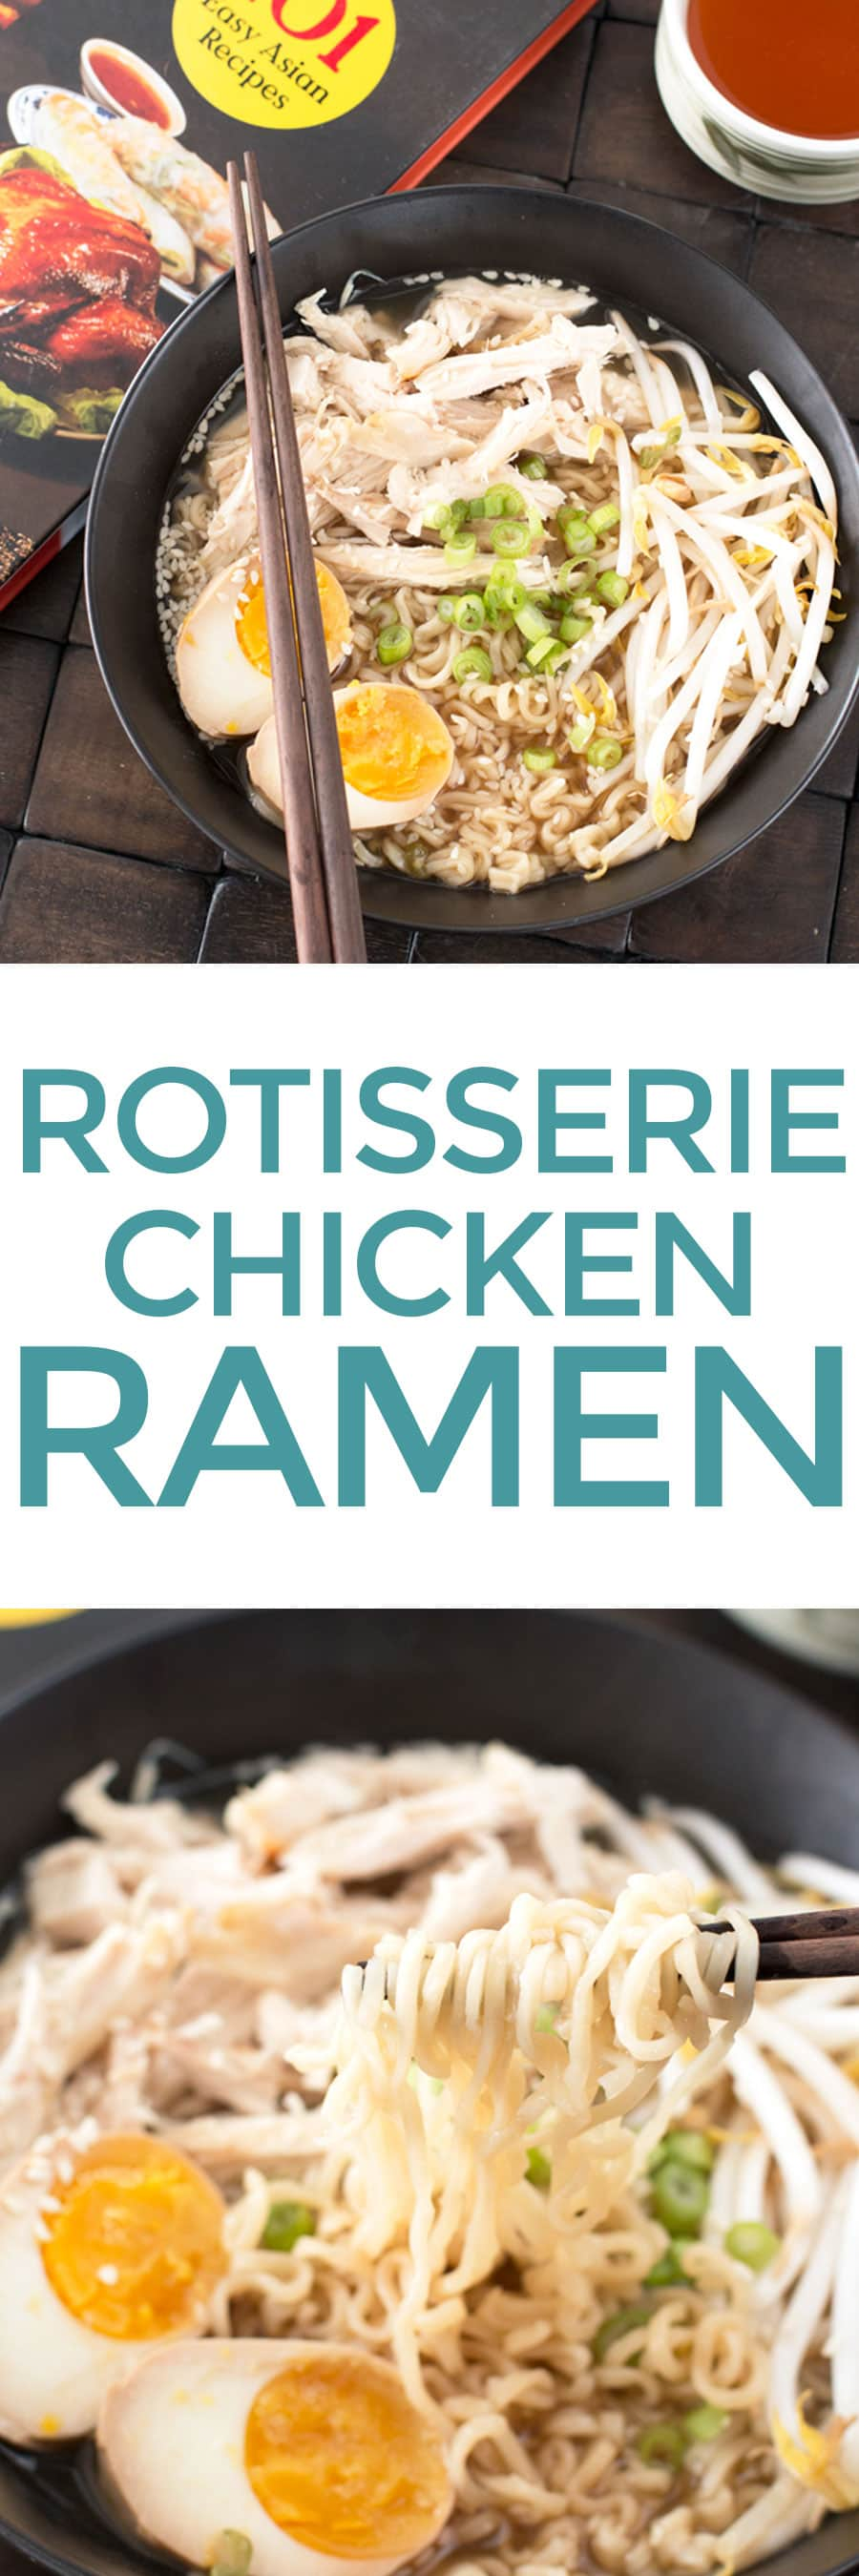 Rotisserie Chicken Ramen | cakenknife.com